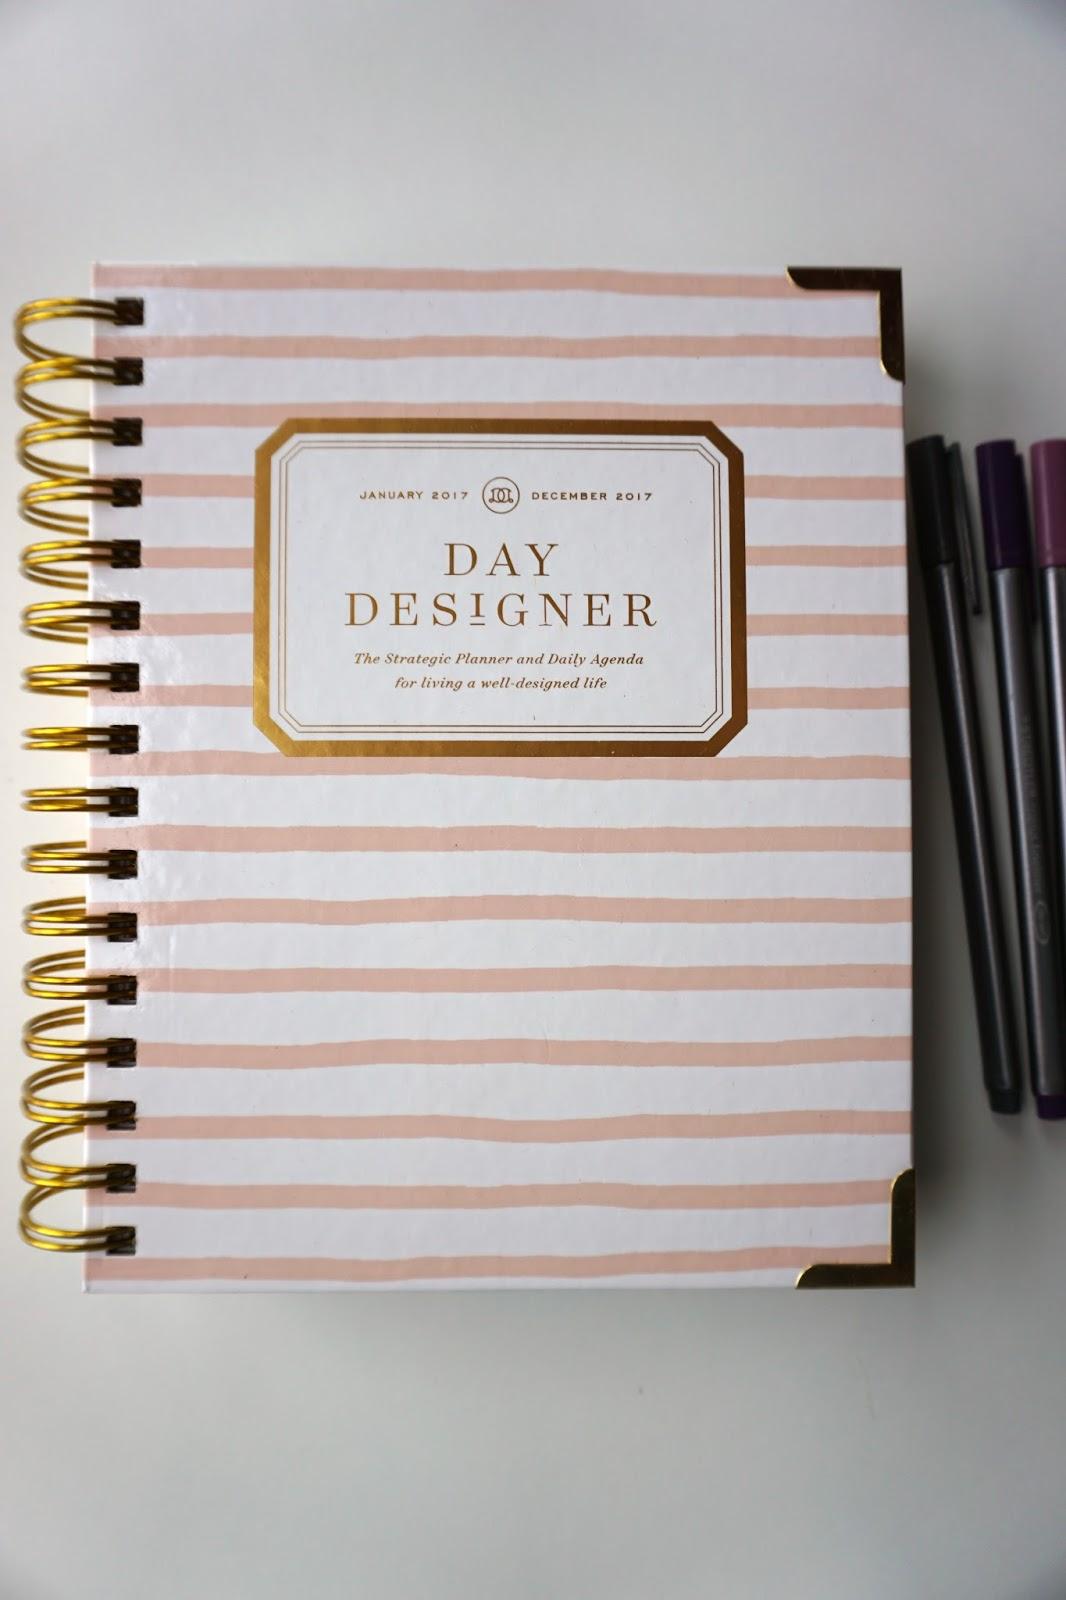 day designer mini review